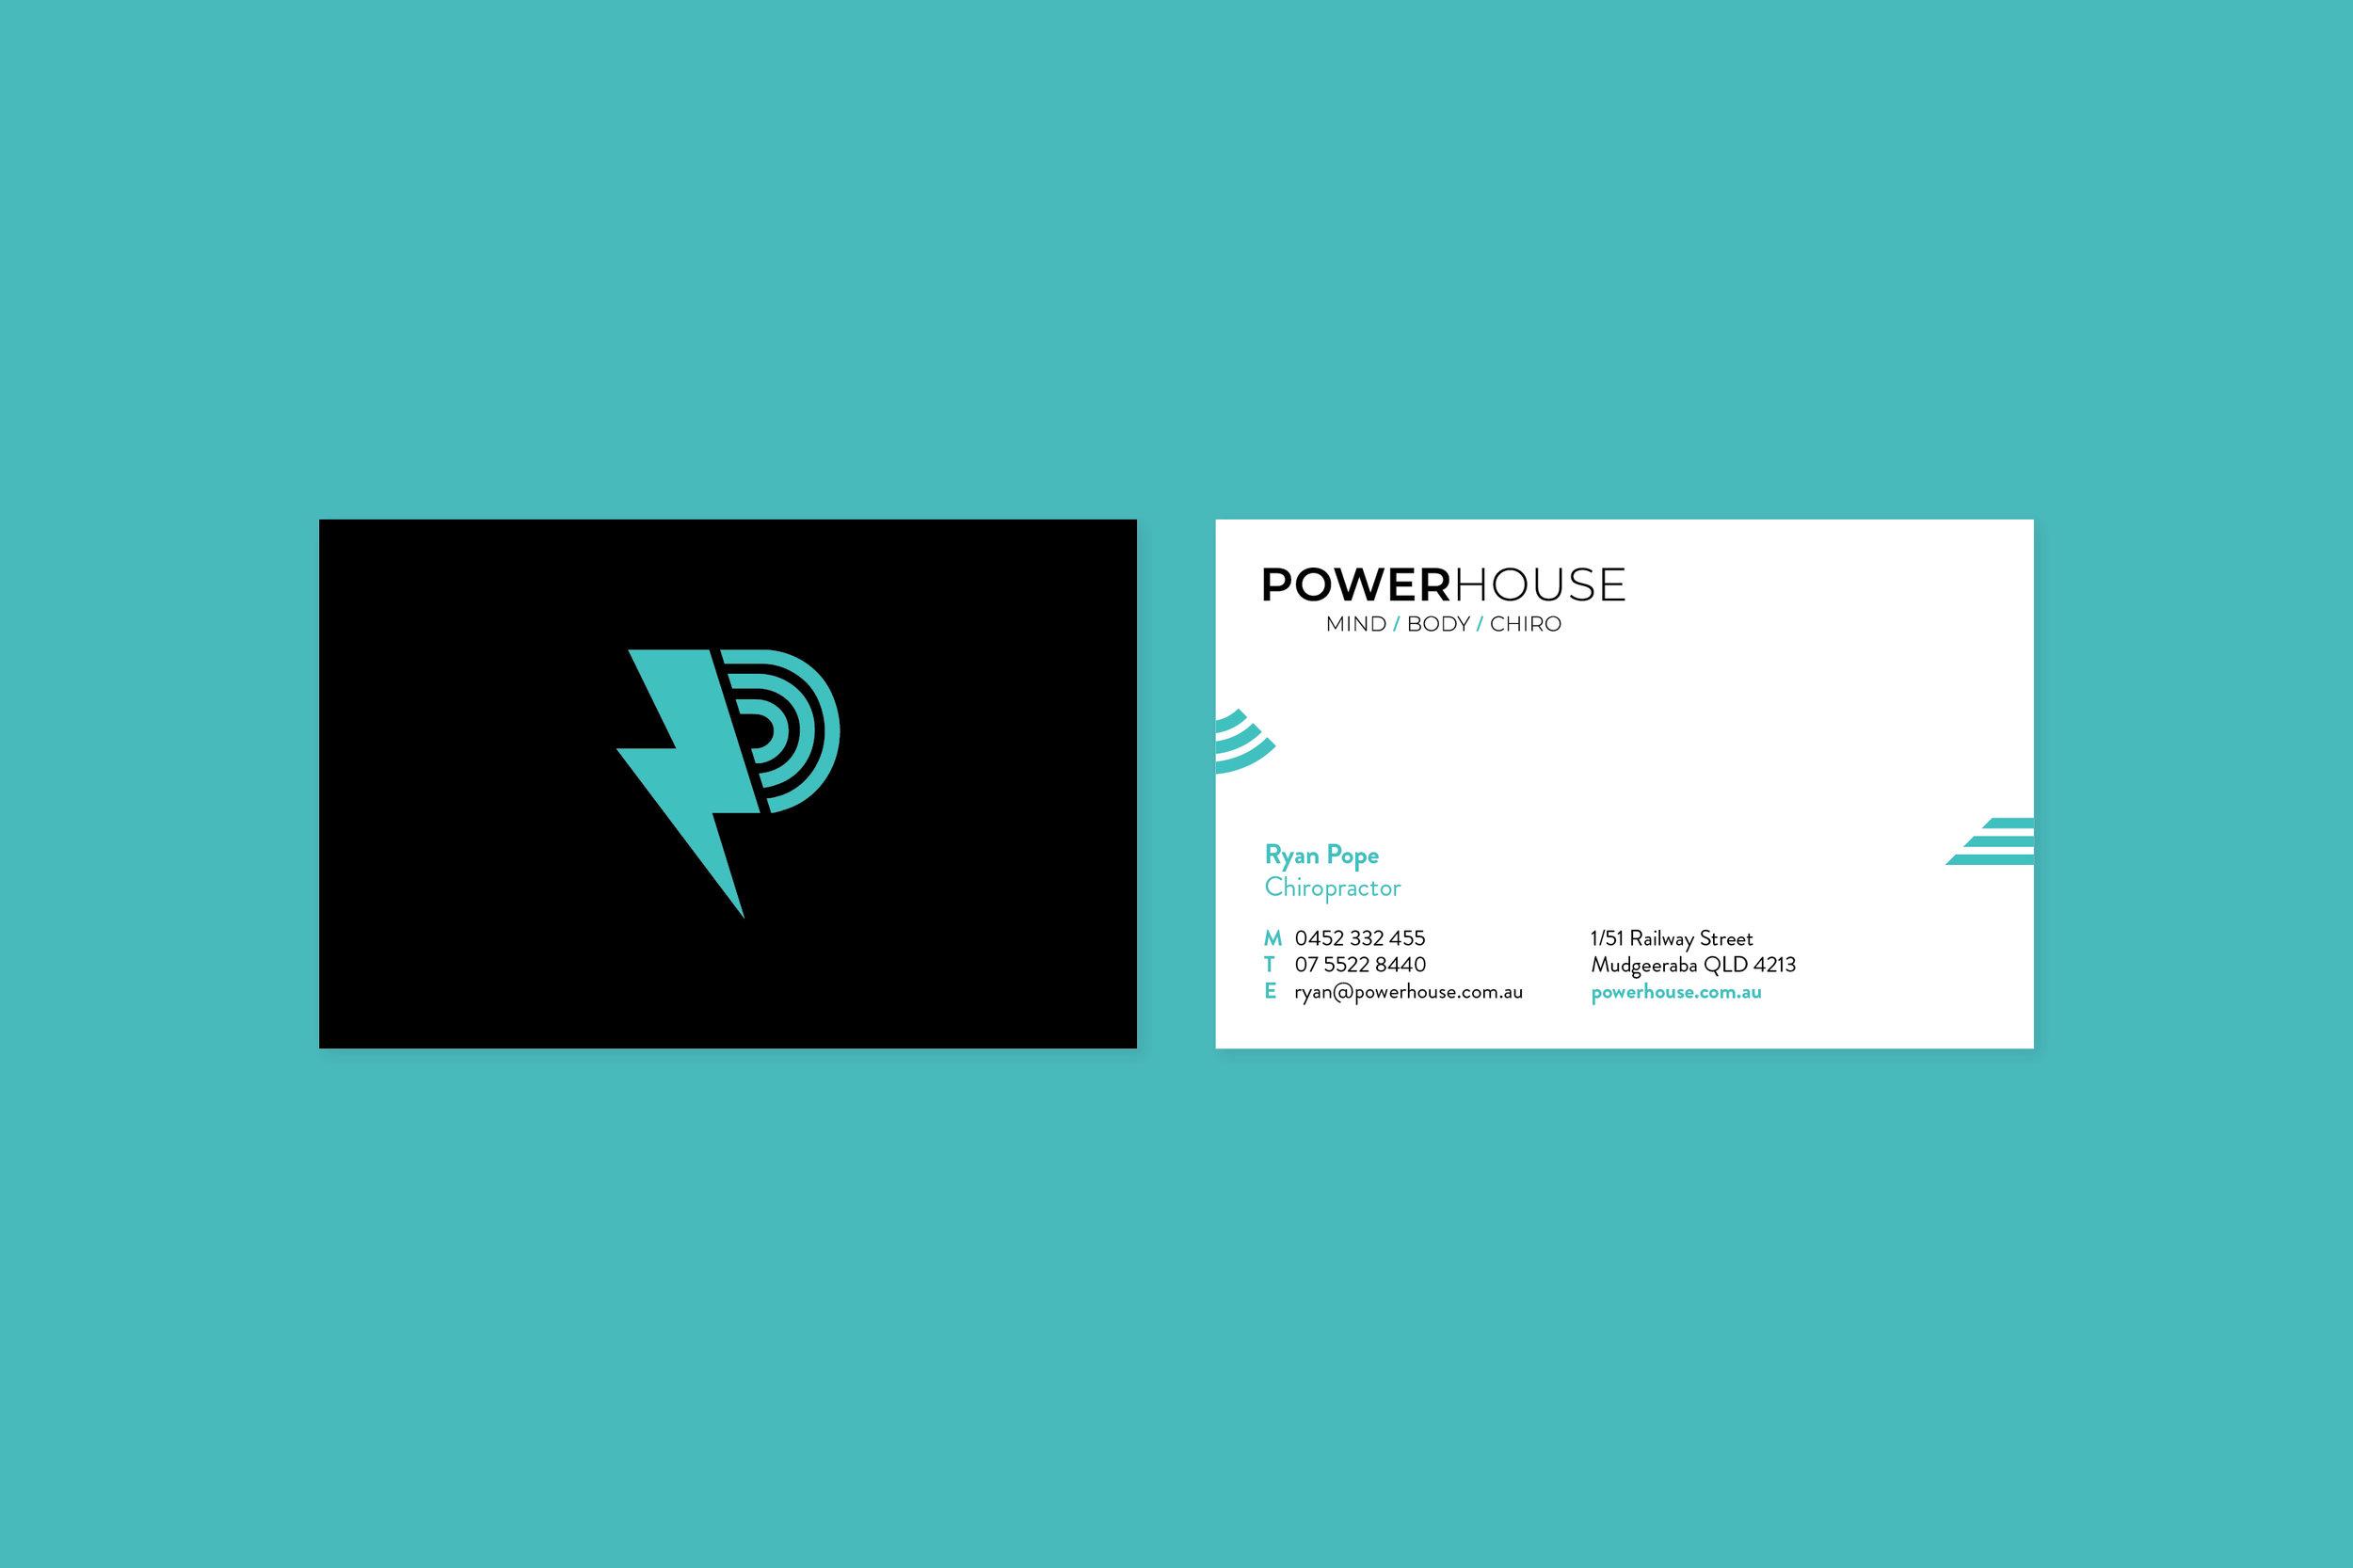 PotionCreative_Powerhouse_WebPres-7.jpg